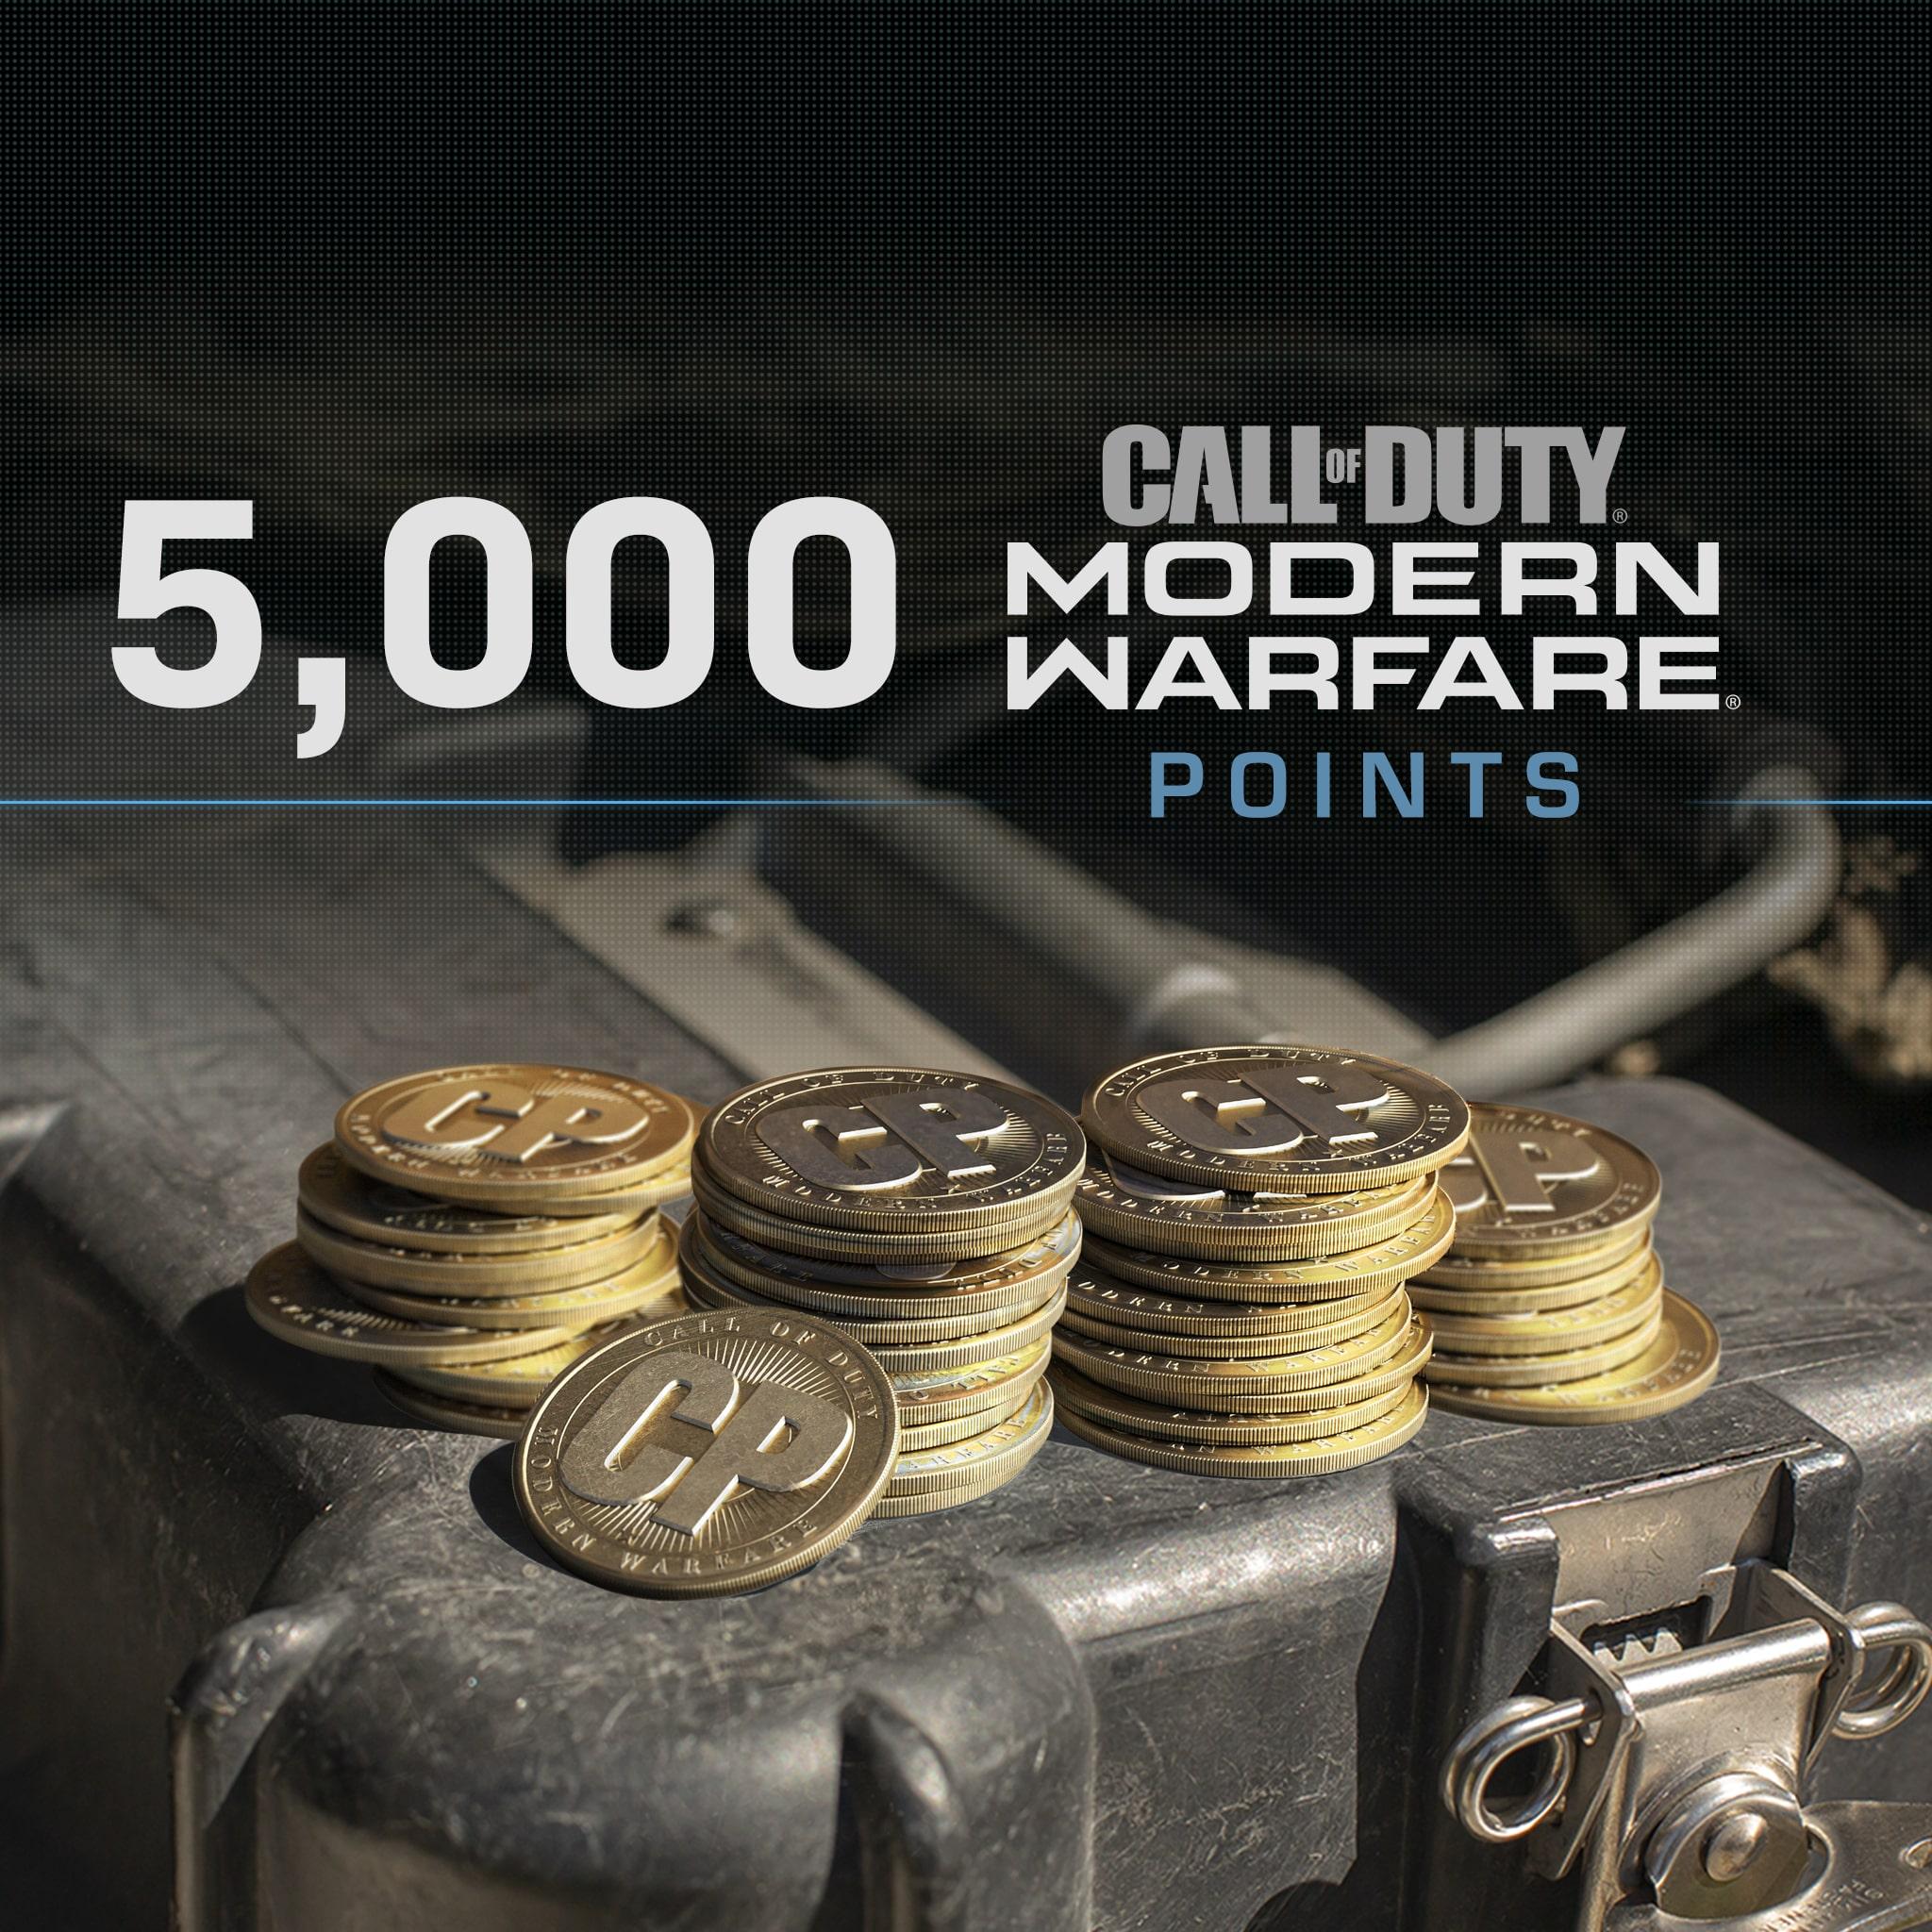 5,000 Call of Duty®: Modern Warfare® Points